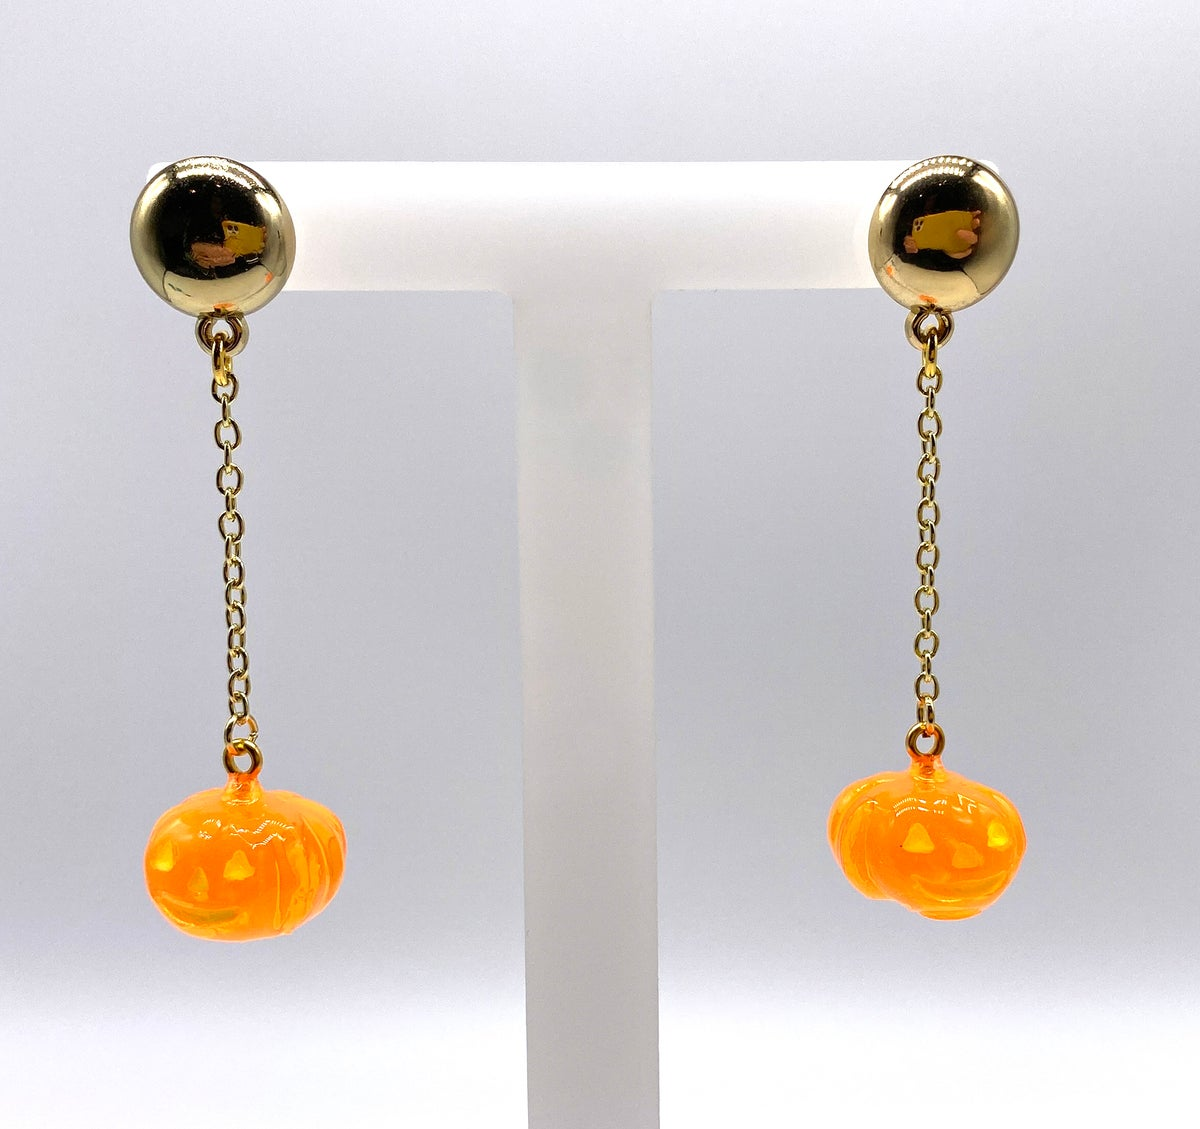 Image of HALLOWEEN PUMPKIN DANGLE EARRINGS Crystal Orange